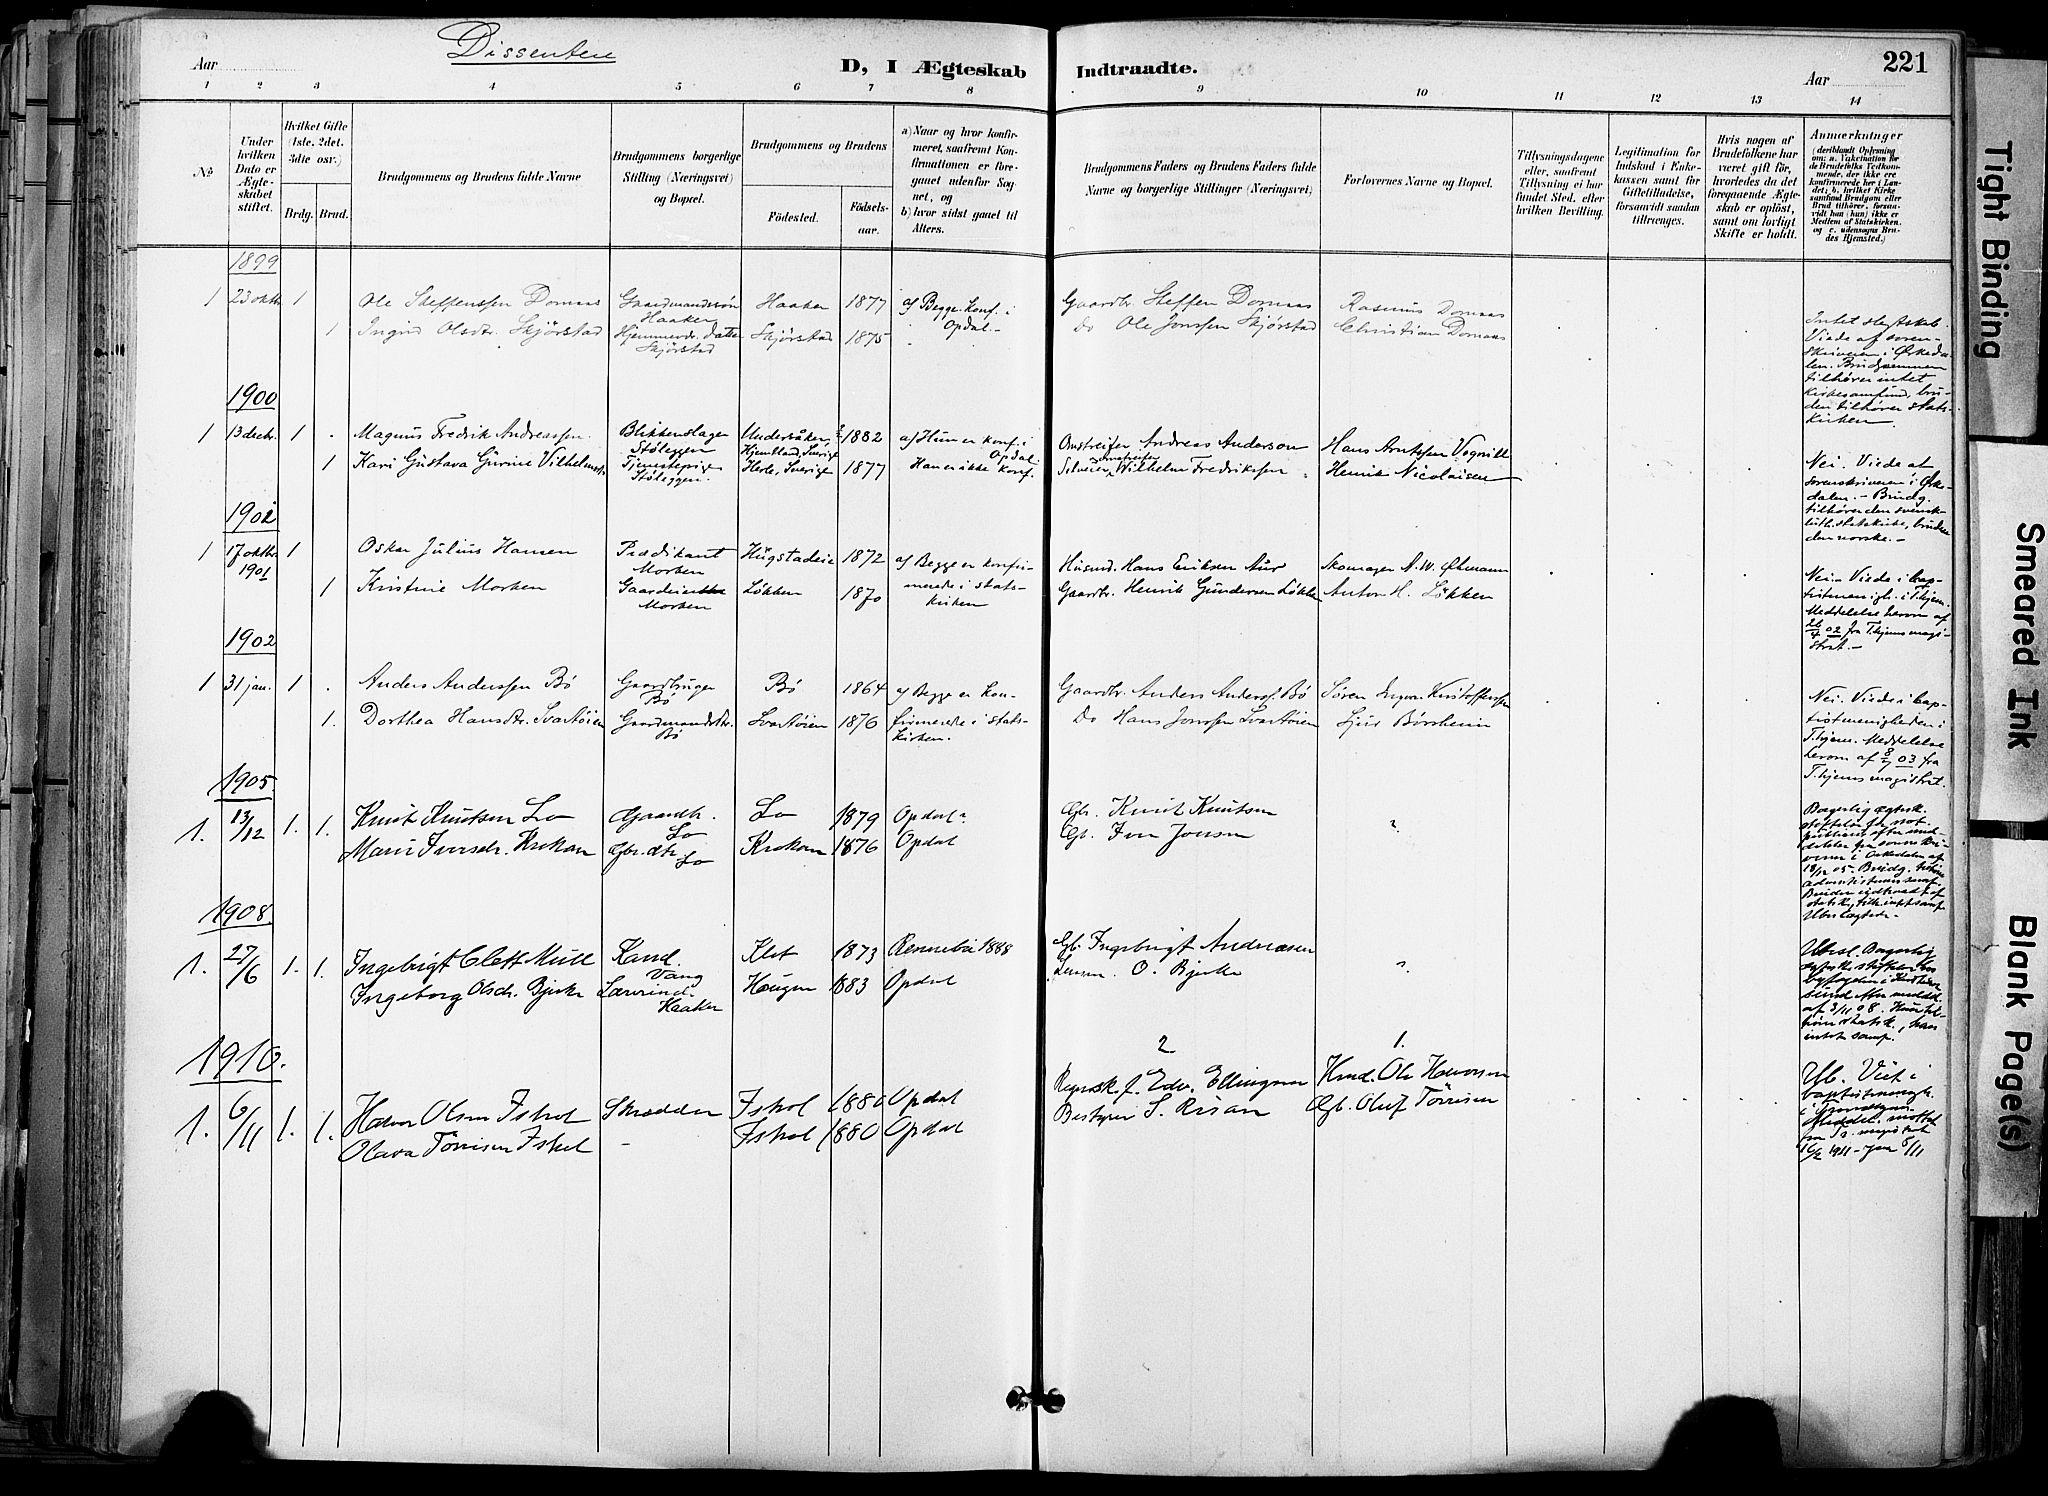 SAT, Ministerialprotokoller, klokkerbøker og fødselsregistre - Sør-Trøndelag, 678/L0902: Parish register (official) no. 678A11, 1895-1911, p. 221